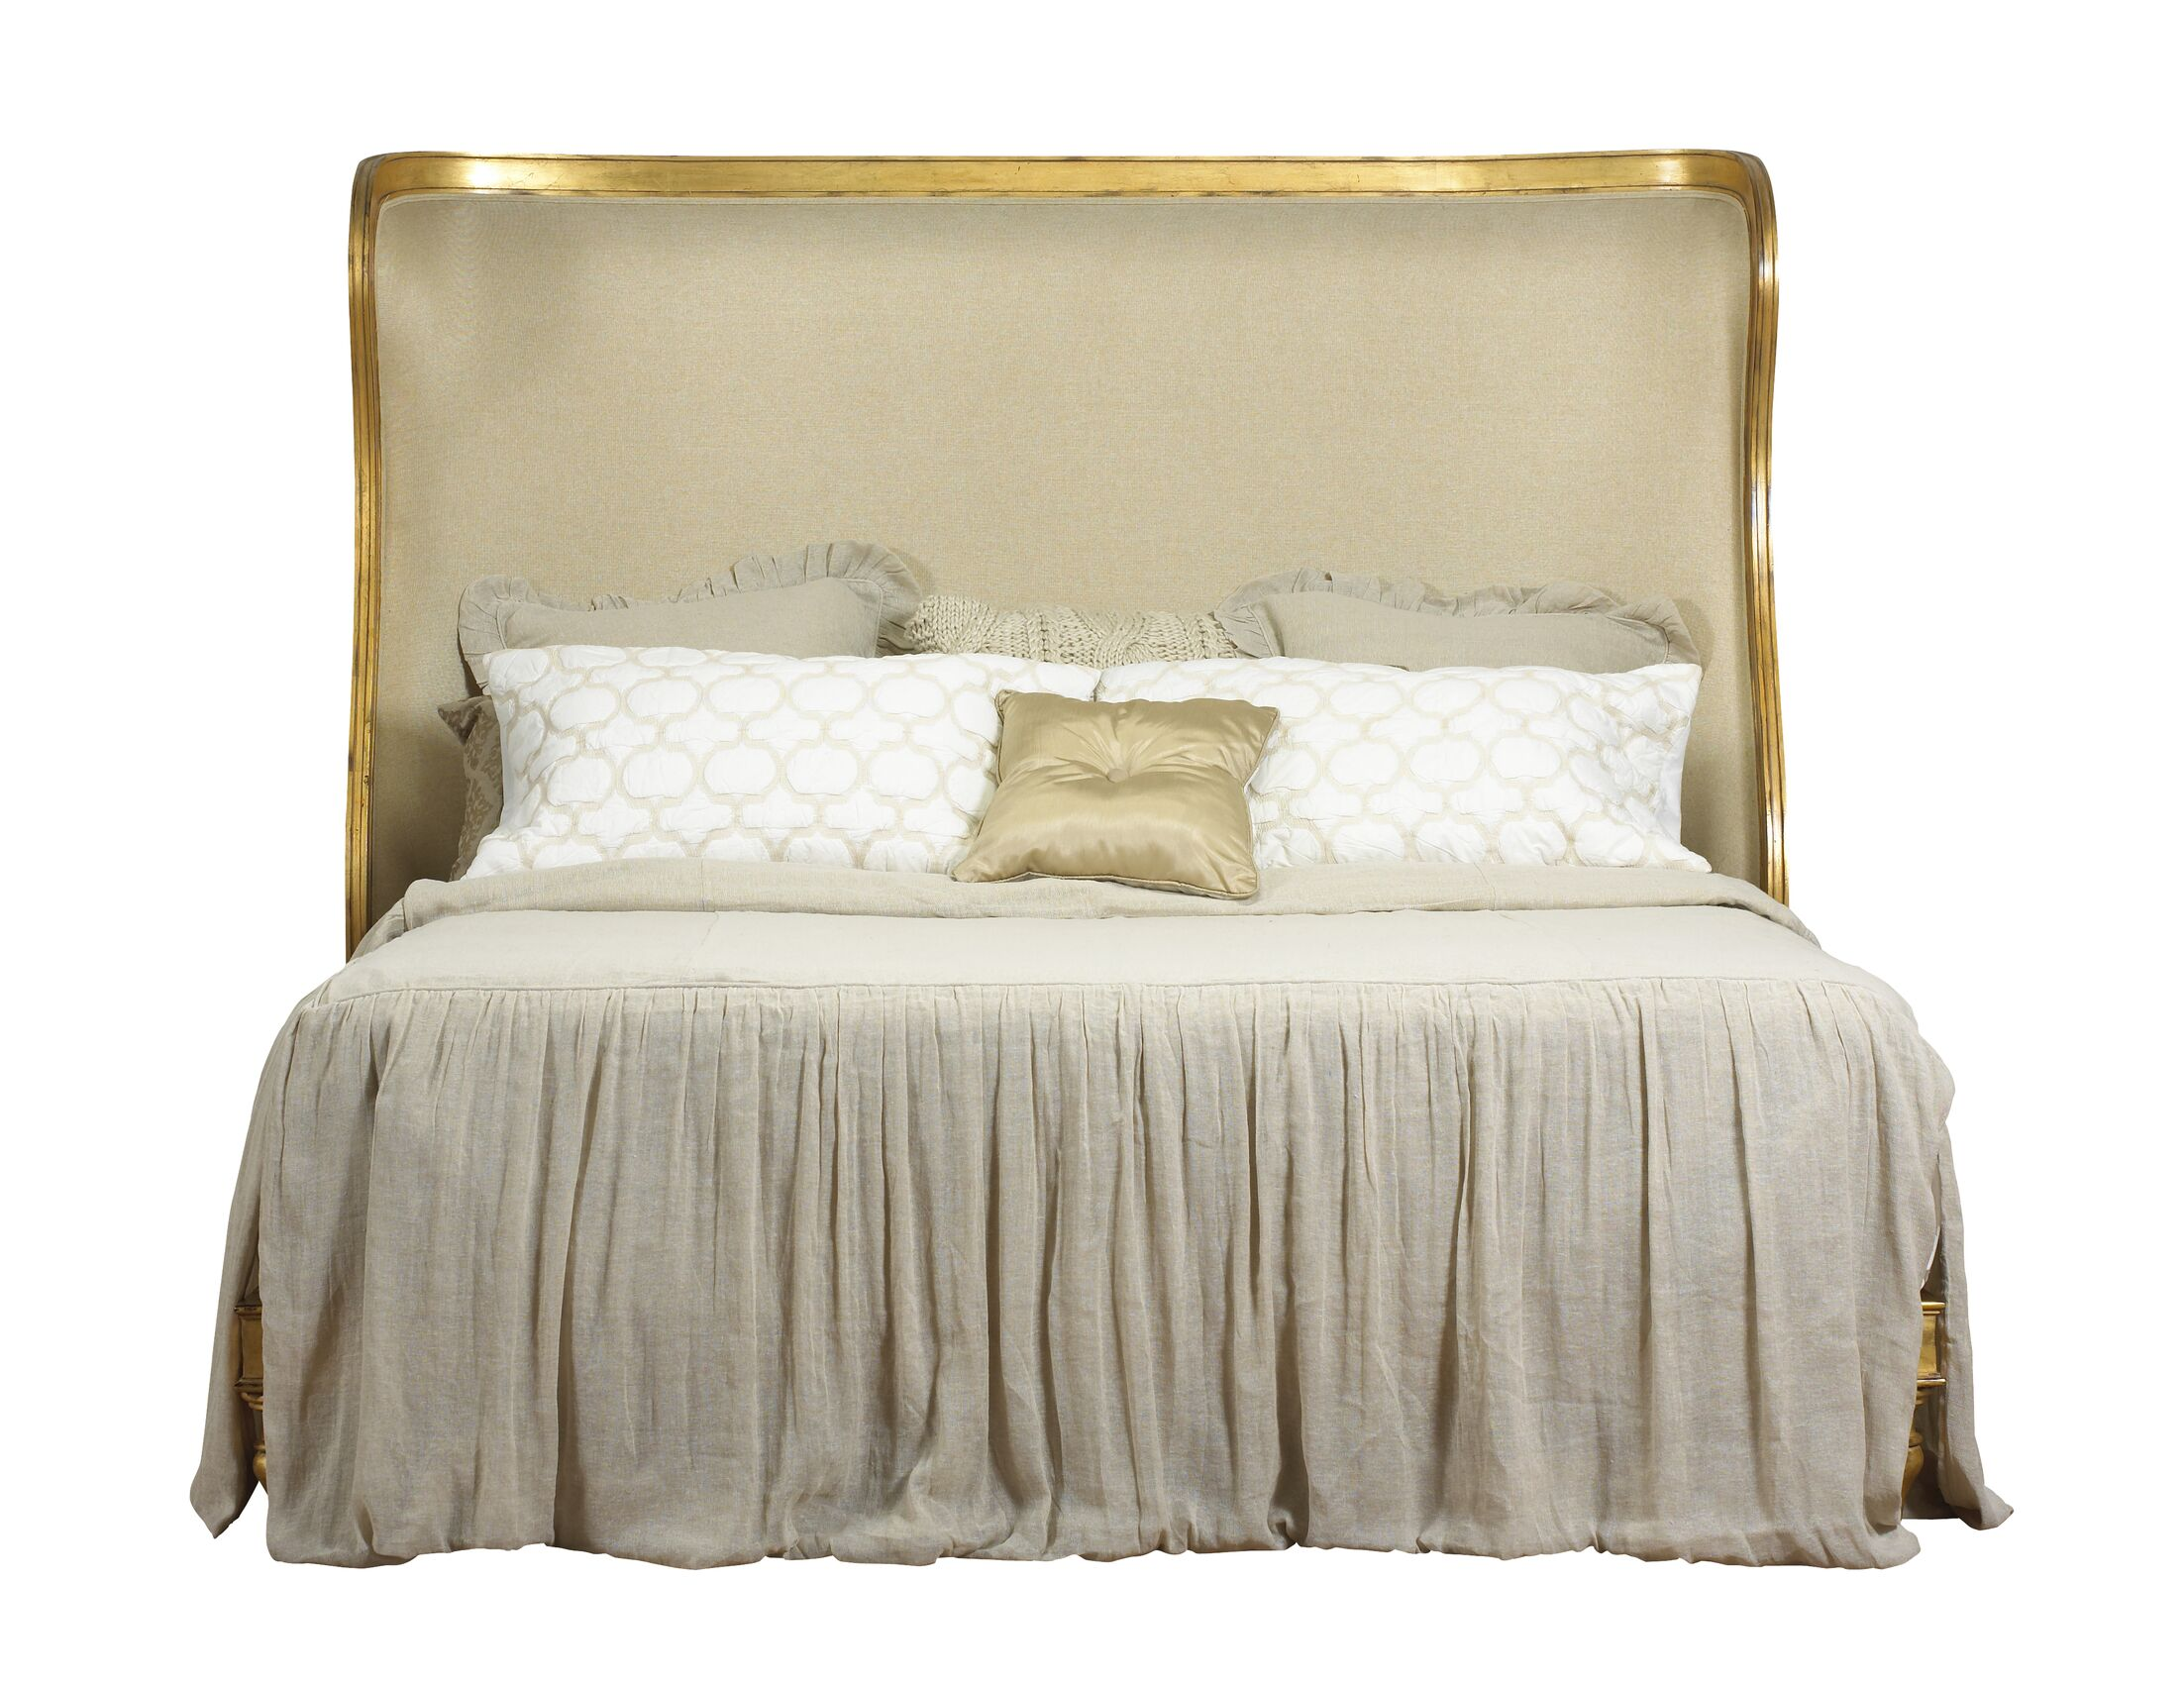 Pizano King Upholstered Platform Bed